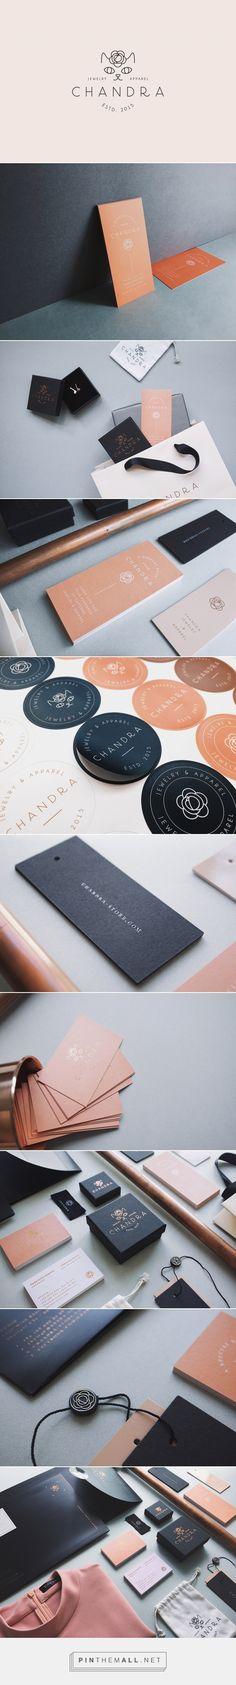 CHANDRA on Behance | Fivestar Branding – Design and Branding Agency & Inspiration Gallery